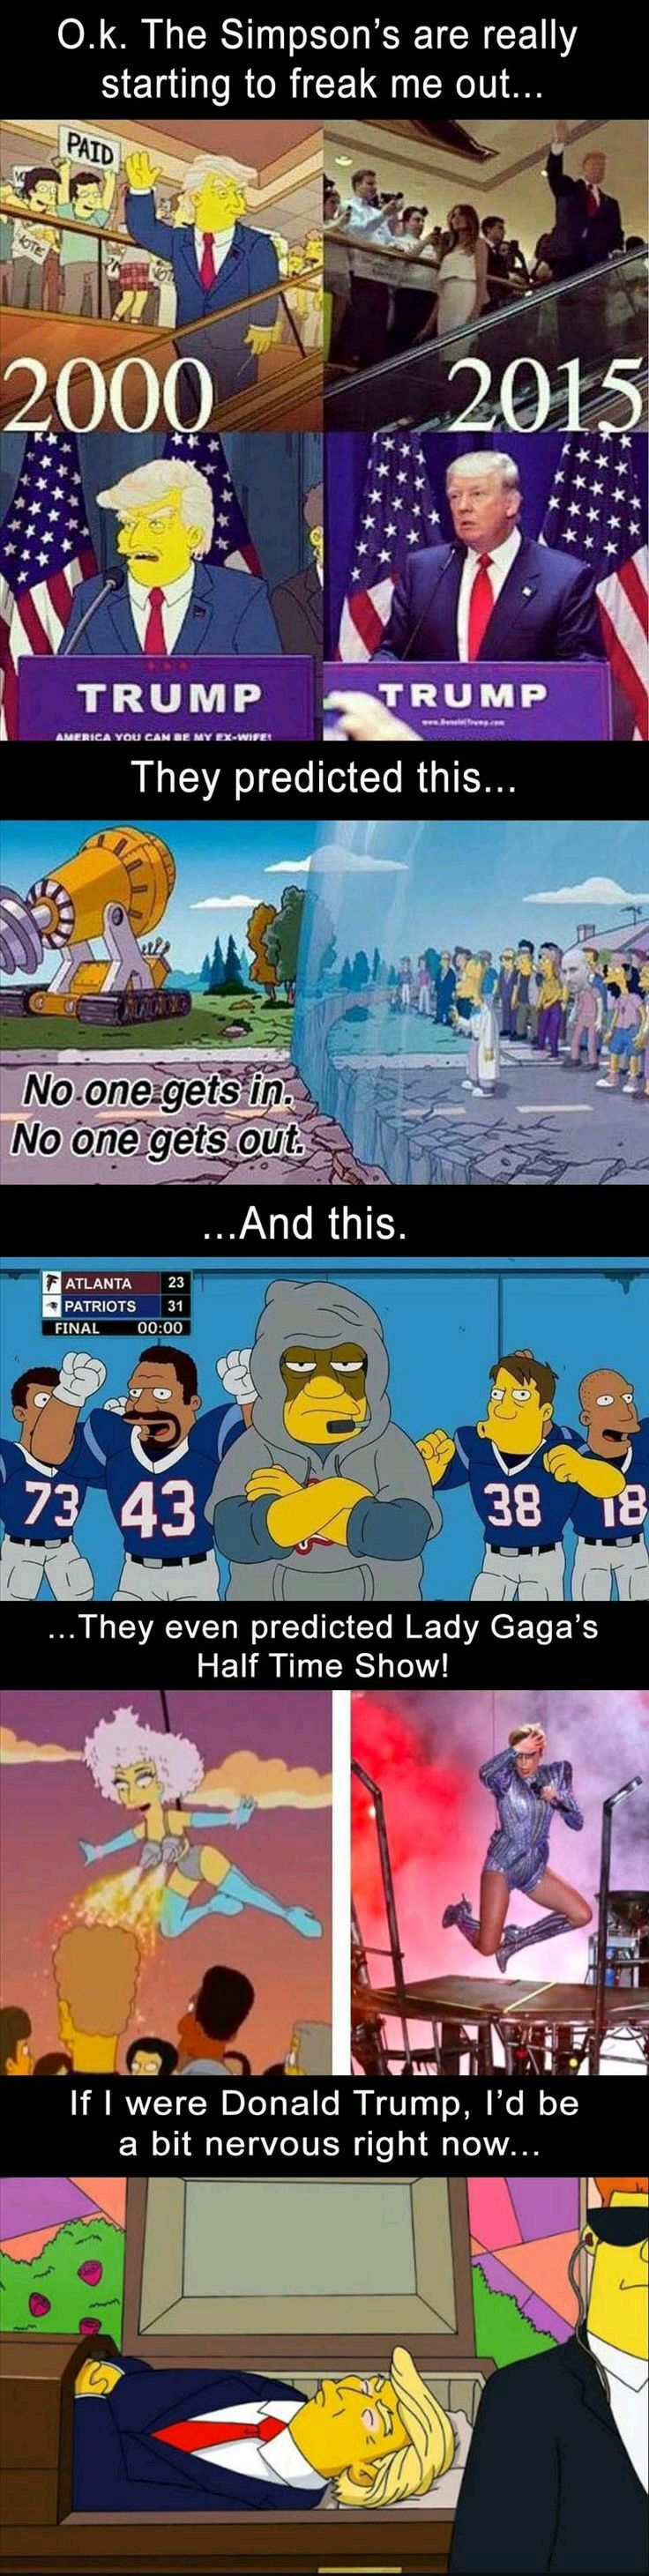 14 best Simpsons images on Pinterest